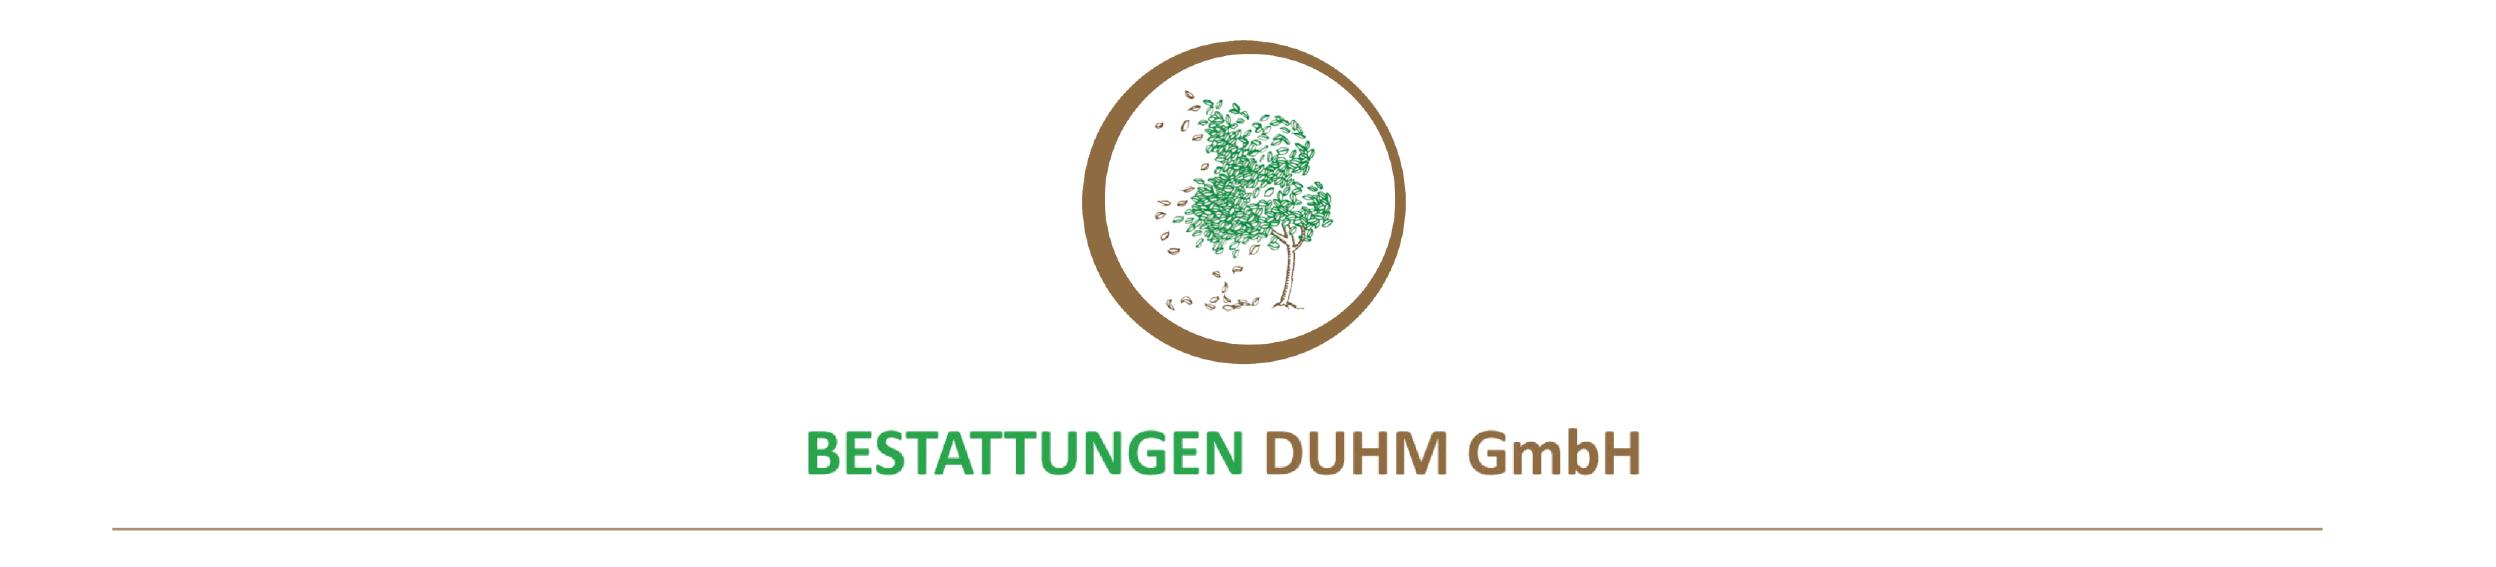 Duhm Bestattungen Logo